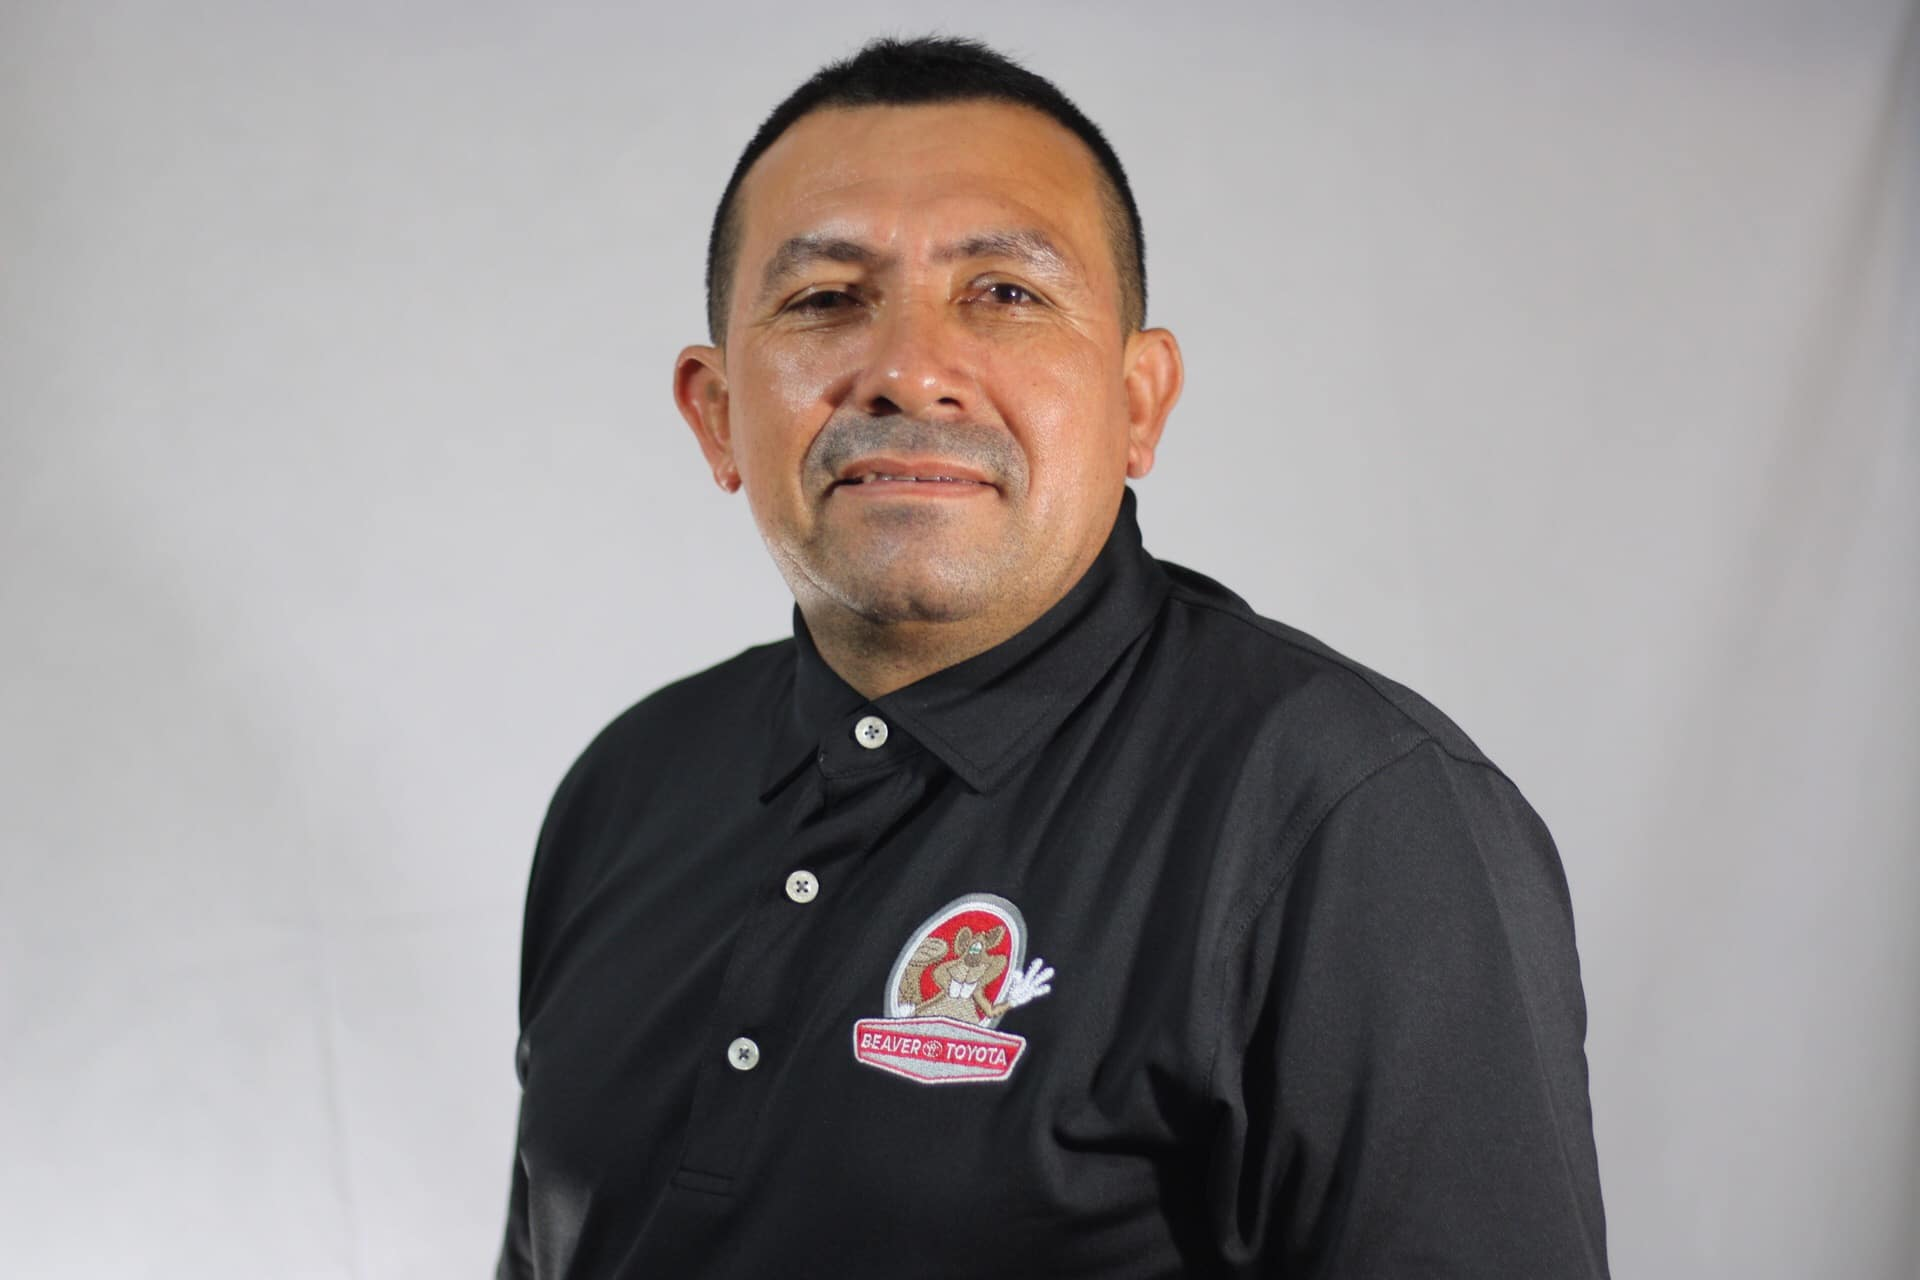 Jose Alvarez-Escobar